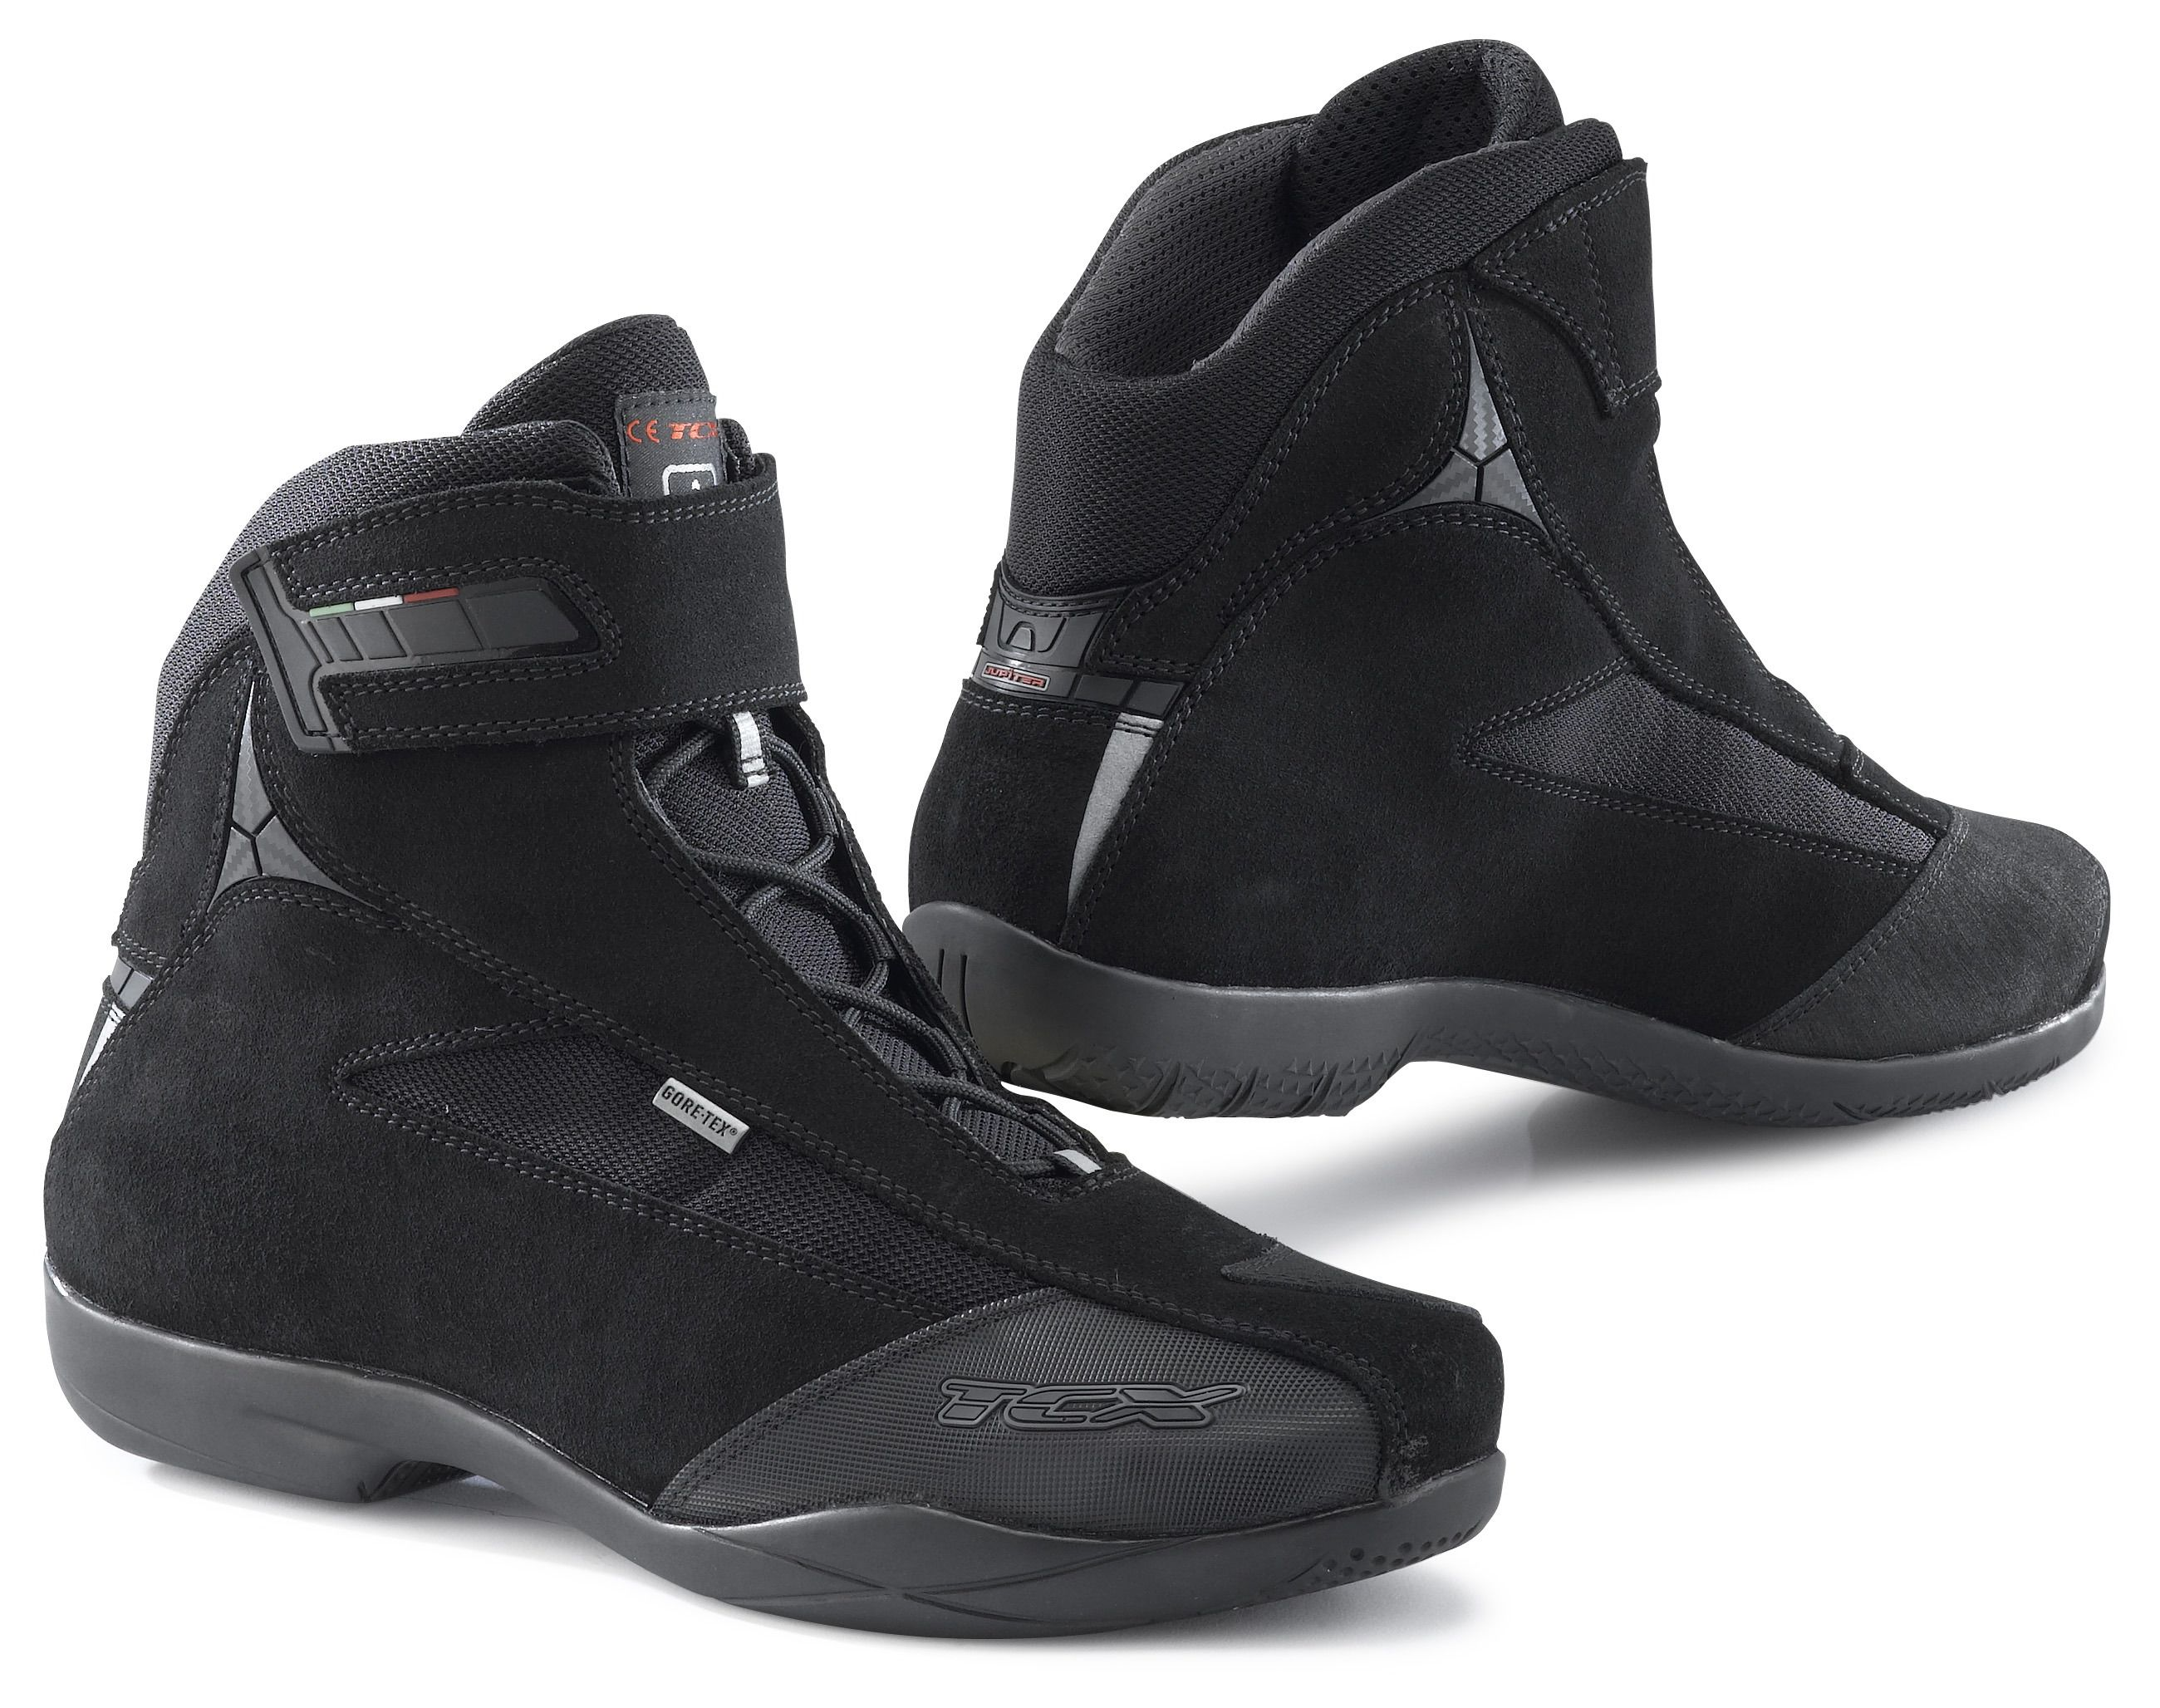 TCX Jupiter EVO Gore-Tex Boots - RevZilla